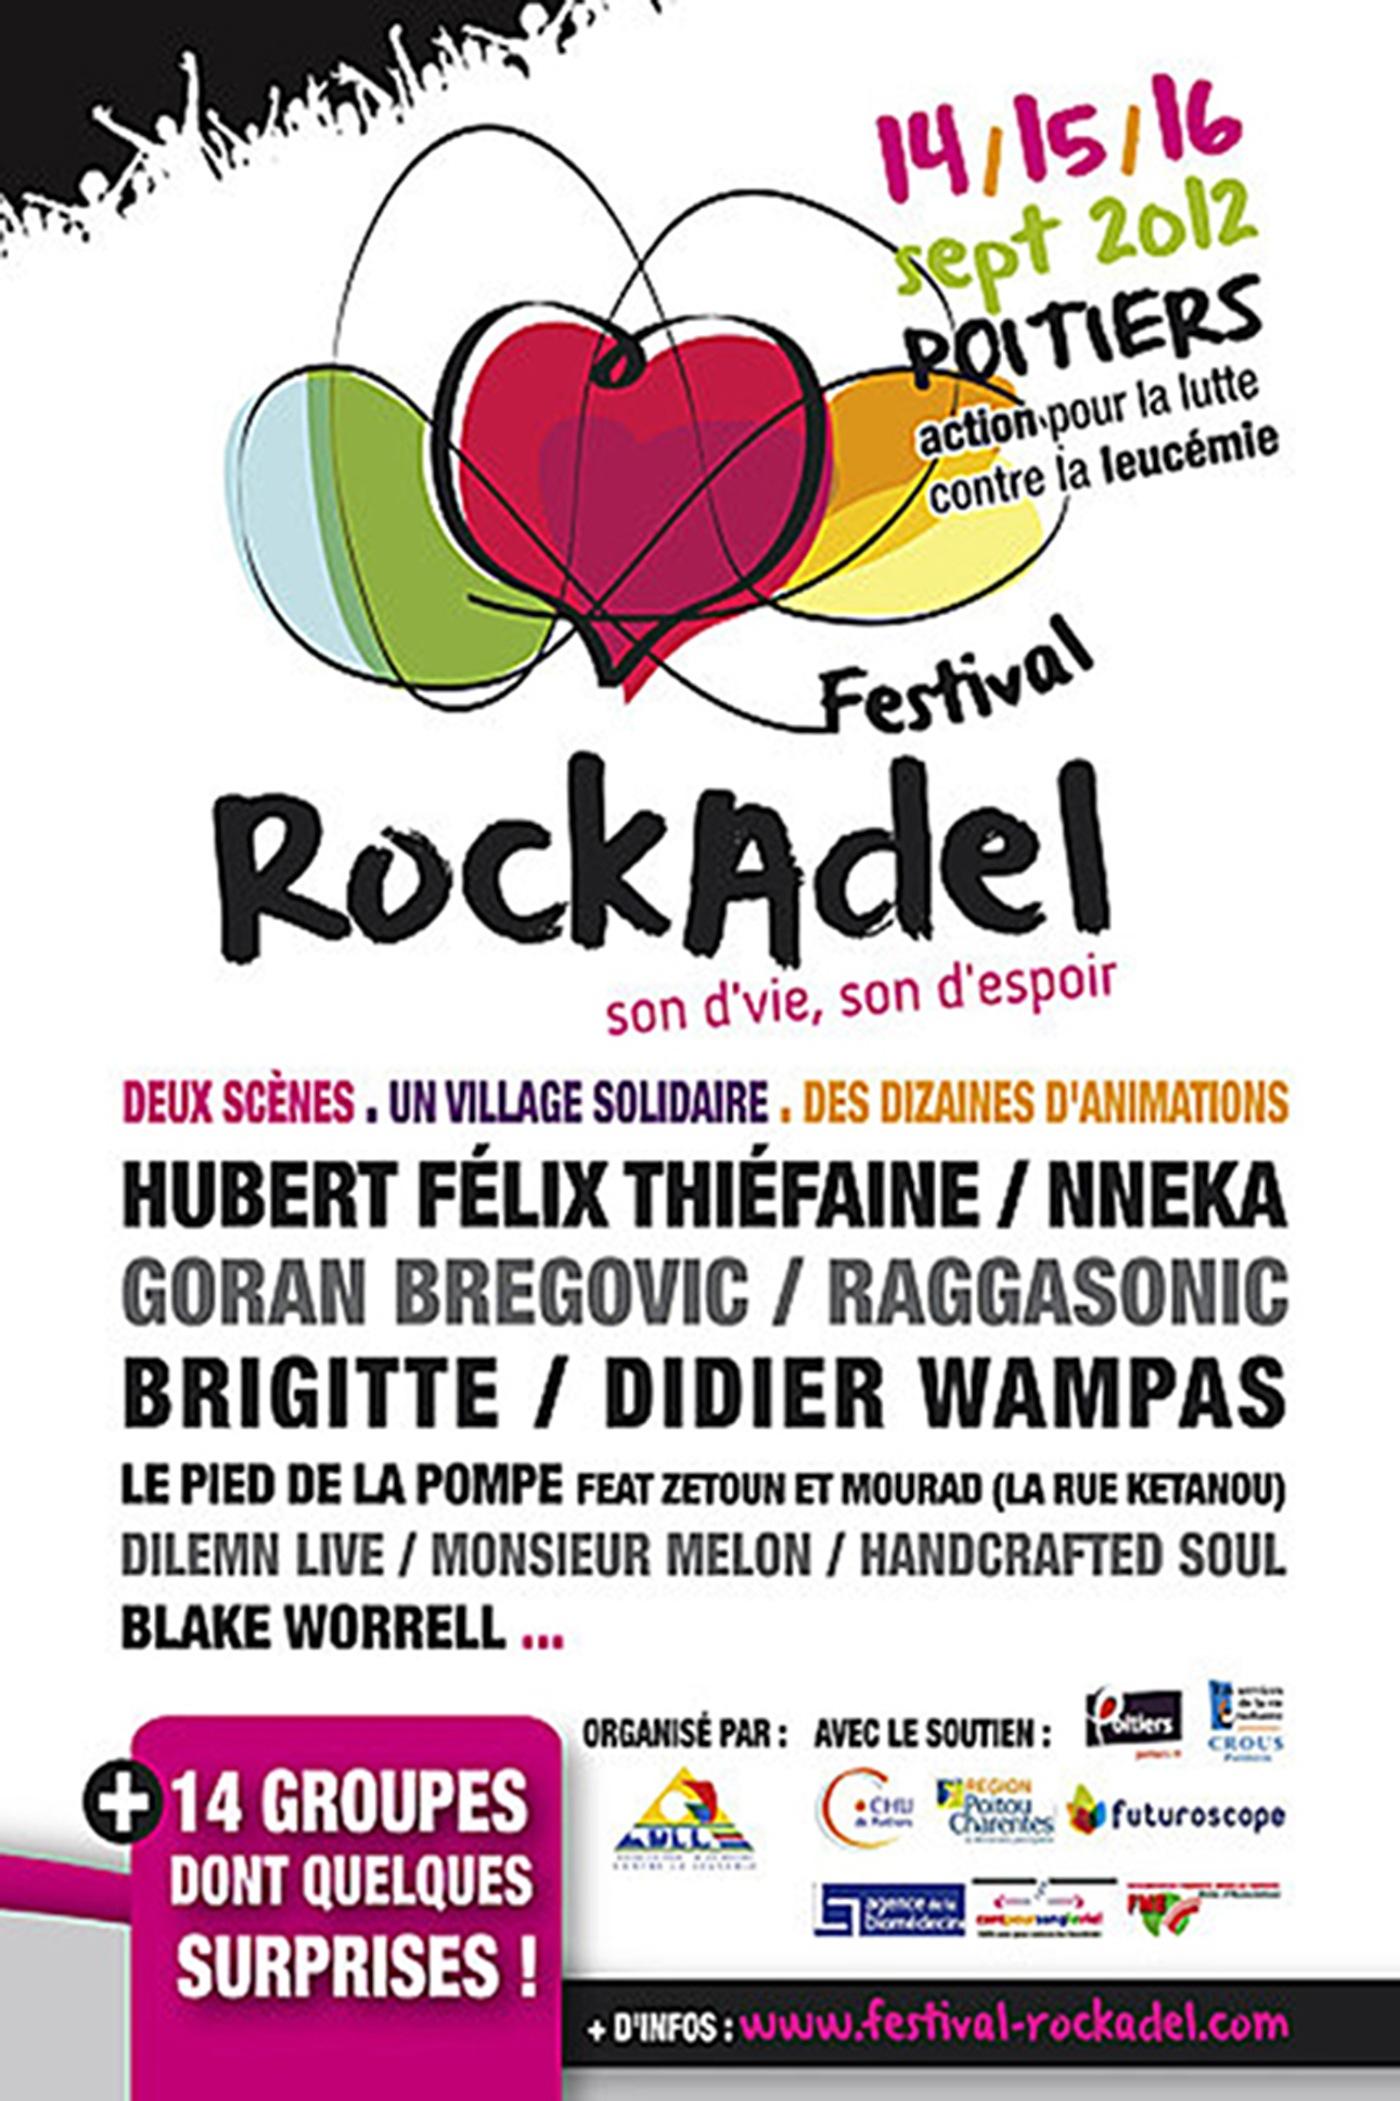 photographe-reportage-festival-rockadel-guillaume-heraud-052-small